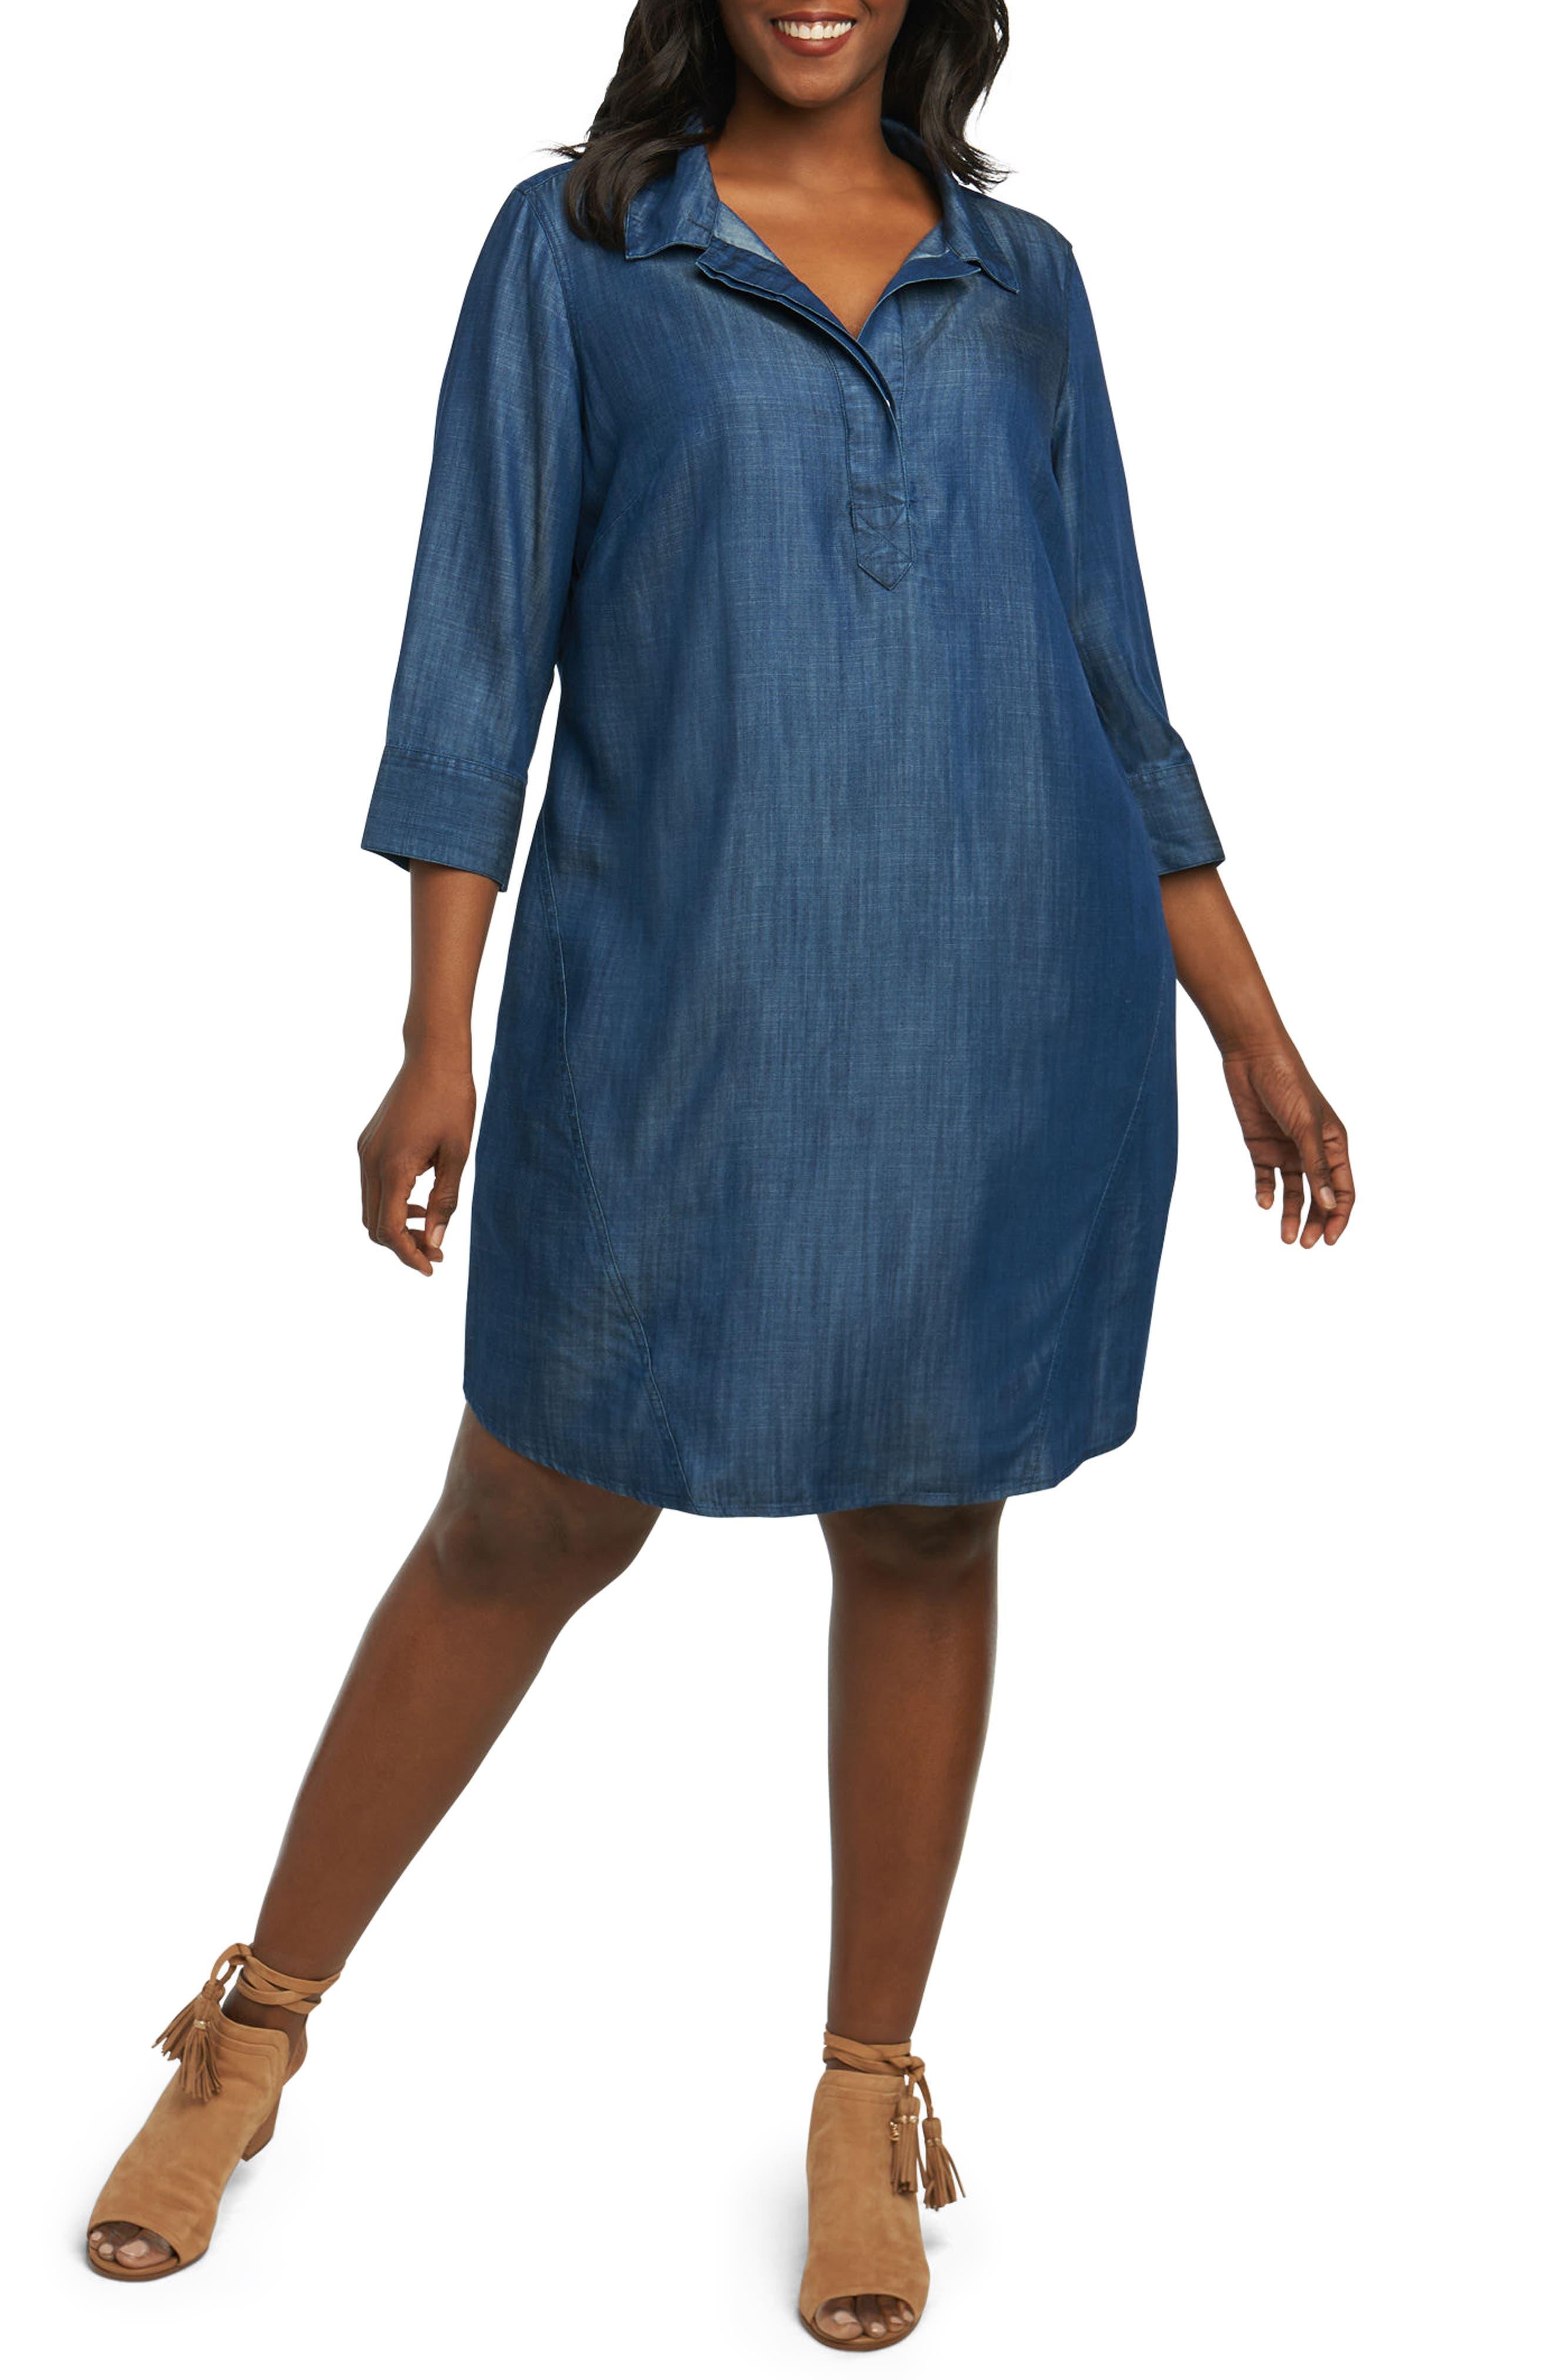 Nicolette Chambray Shift Dress,                             Main thumbnail 1, color,                             415